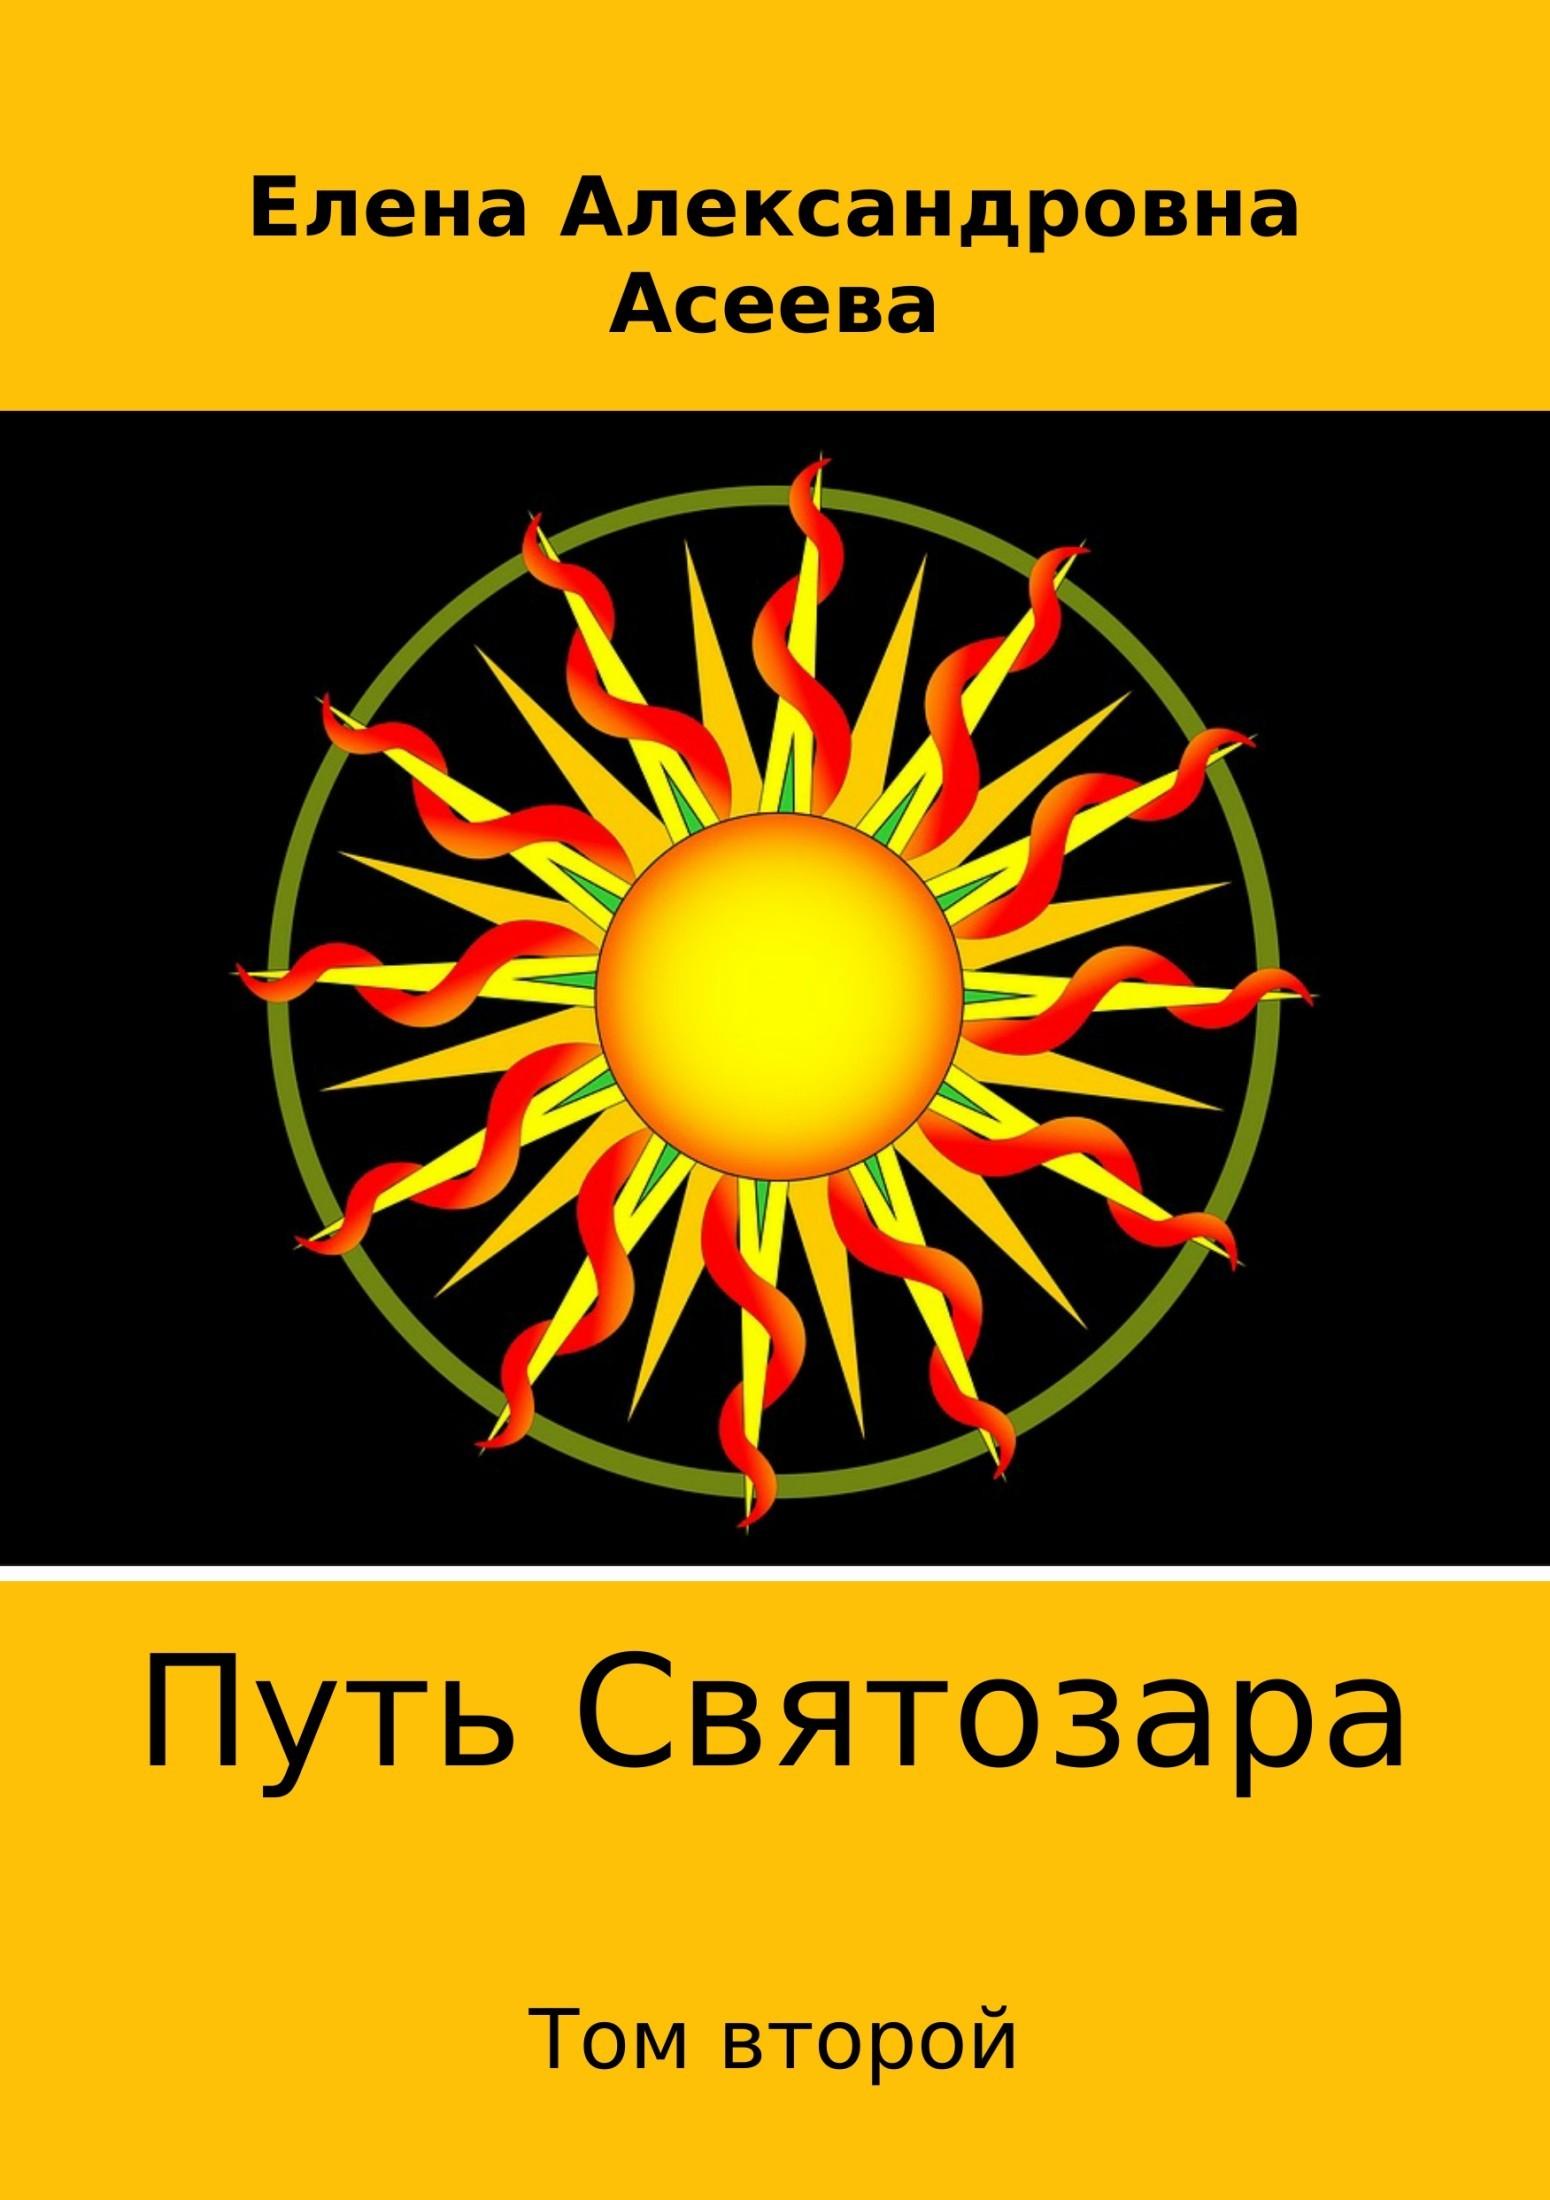 Елена Александровна Асеева Путь Святозара. Том второй елена александровна асеева коло жизни средина том второй